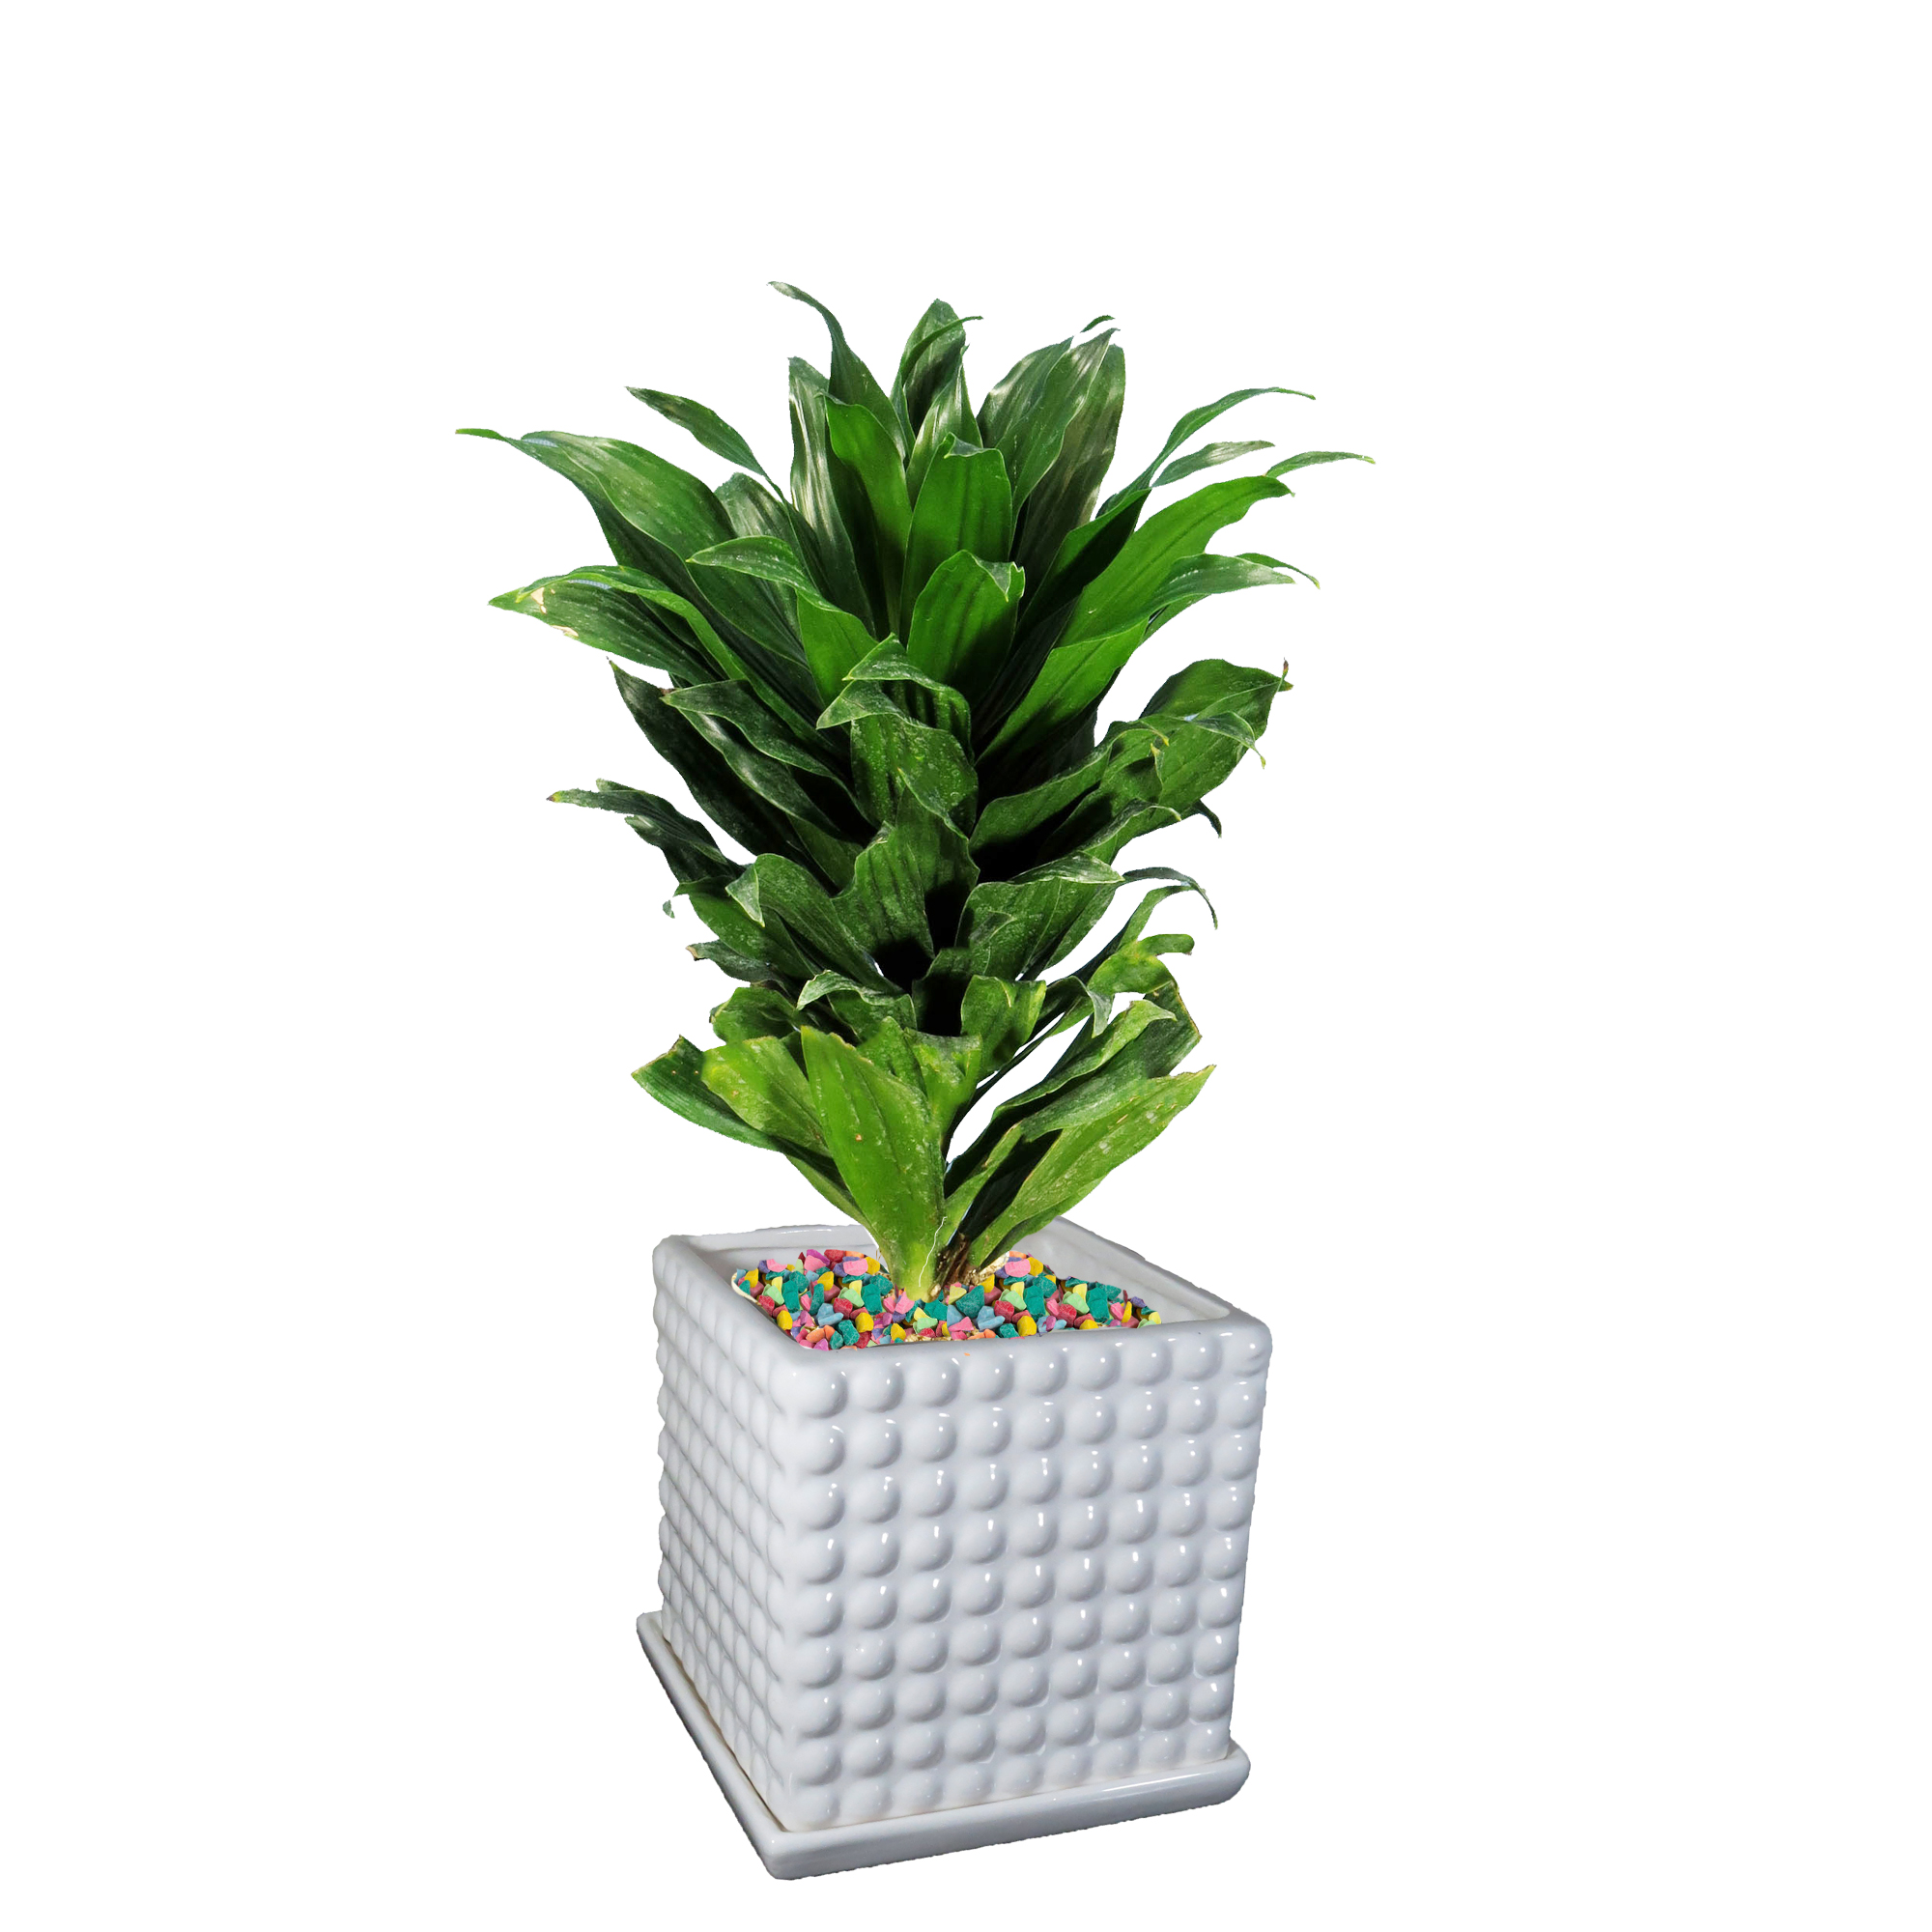 گیاه طبیعی دراسنا کامپکت کد As-16.1